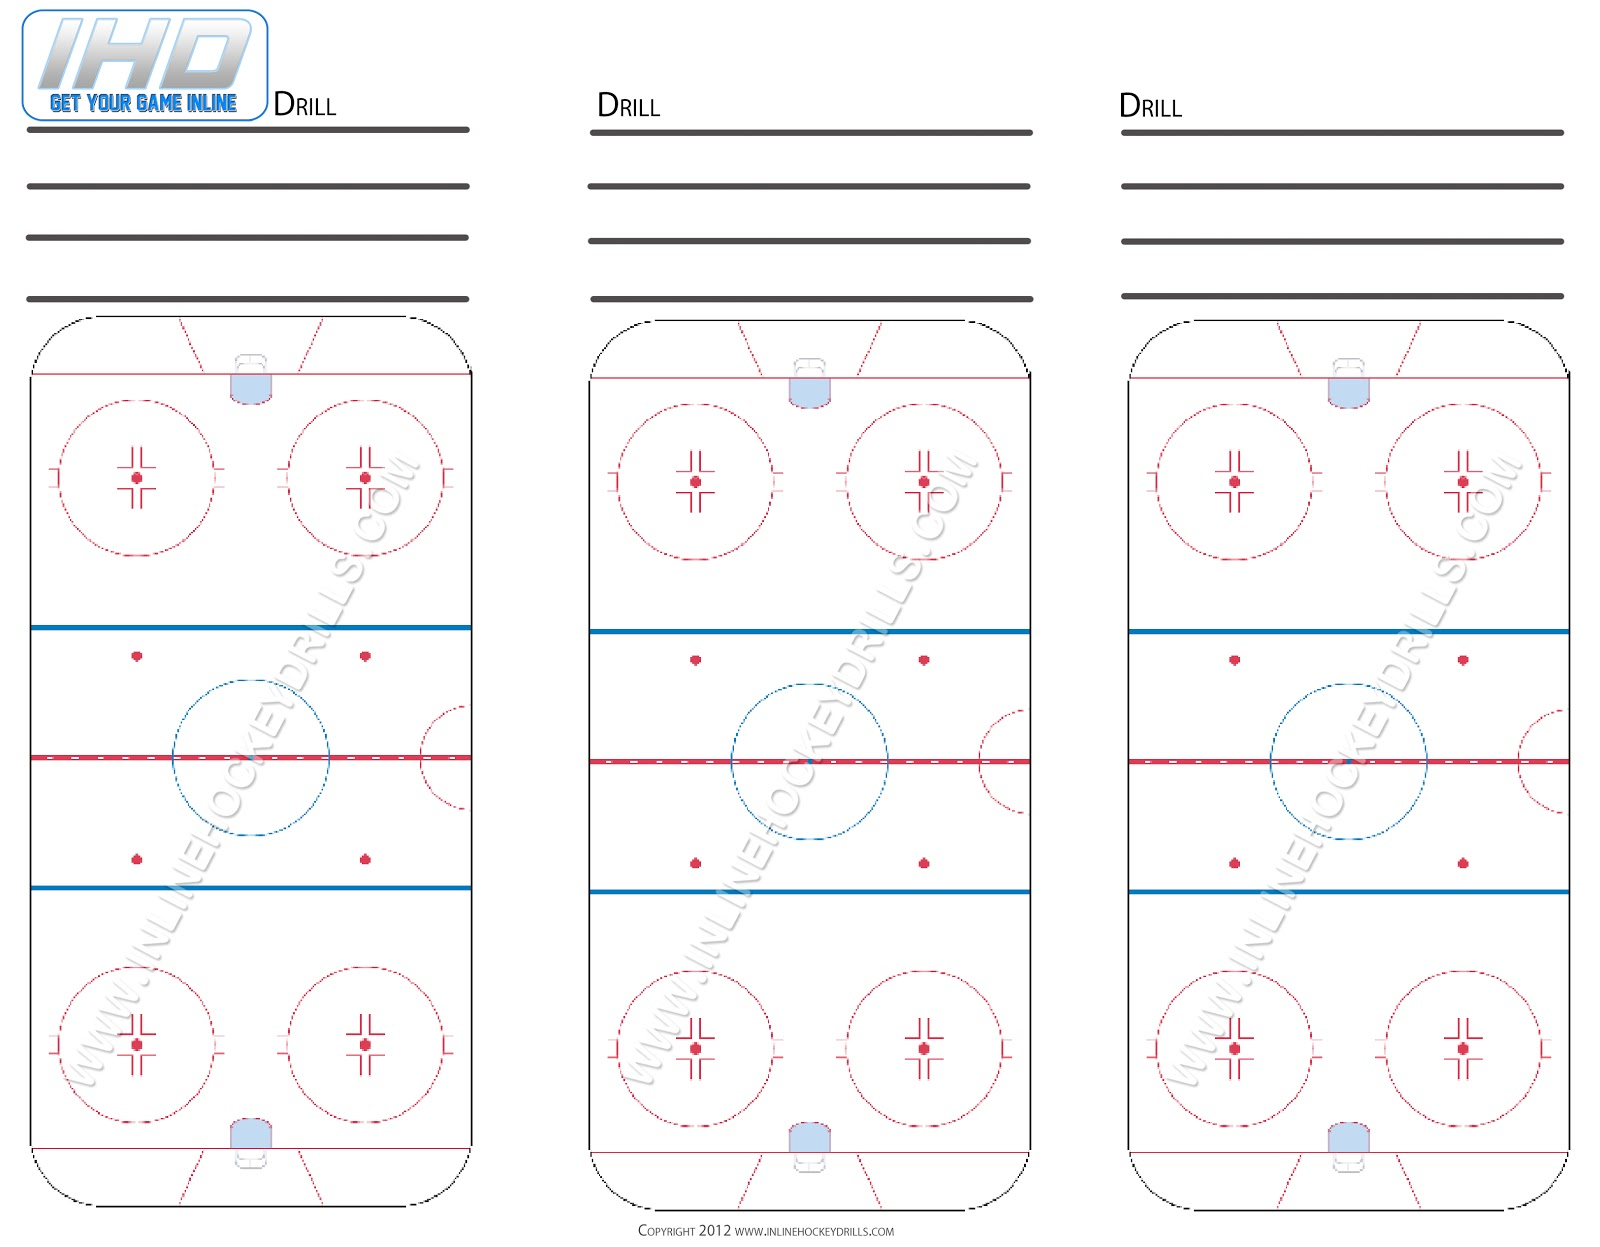 nhl hockey rink diagram printable 2000 ford ranger parts blank downloads inline drills